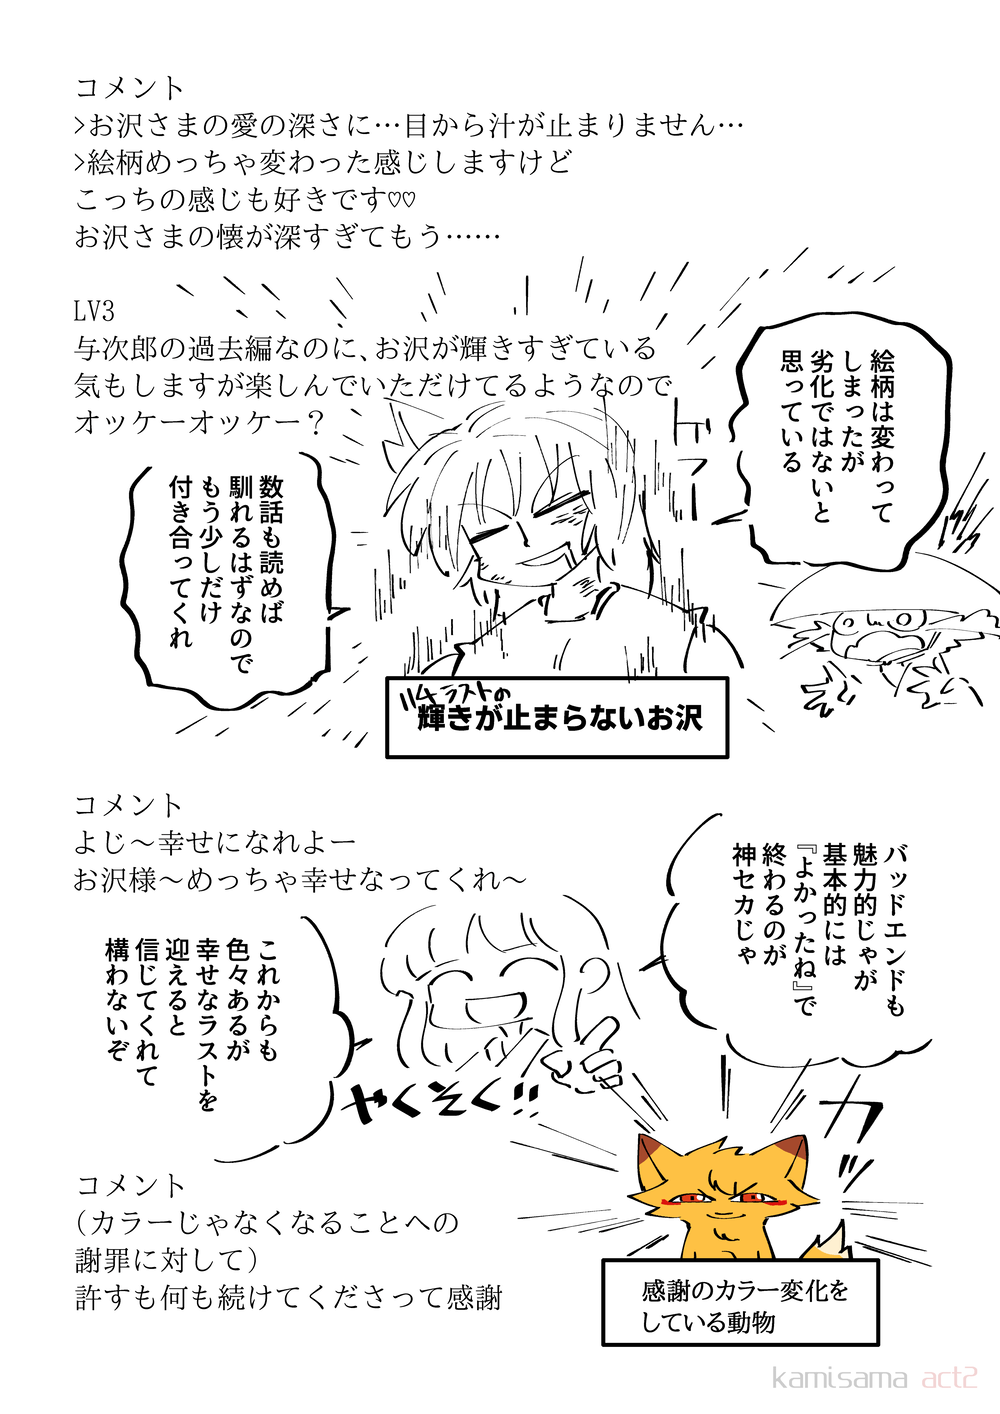 2life115_024.png